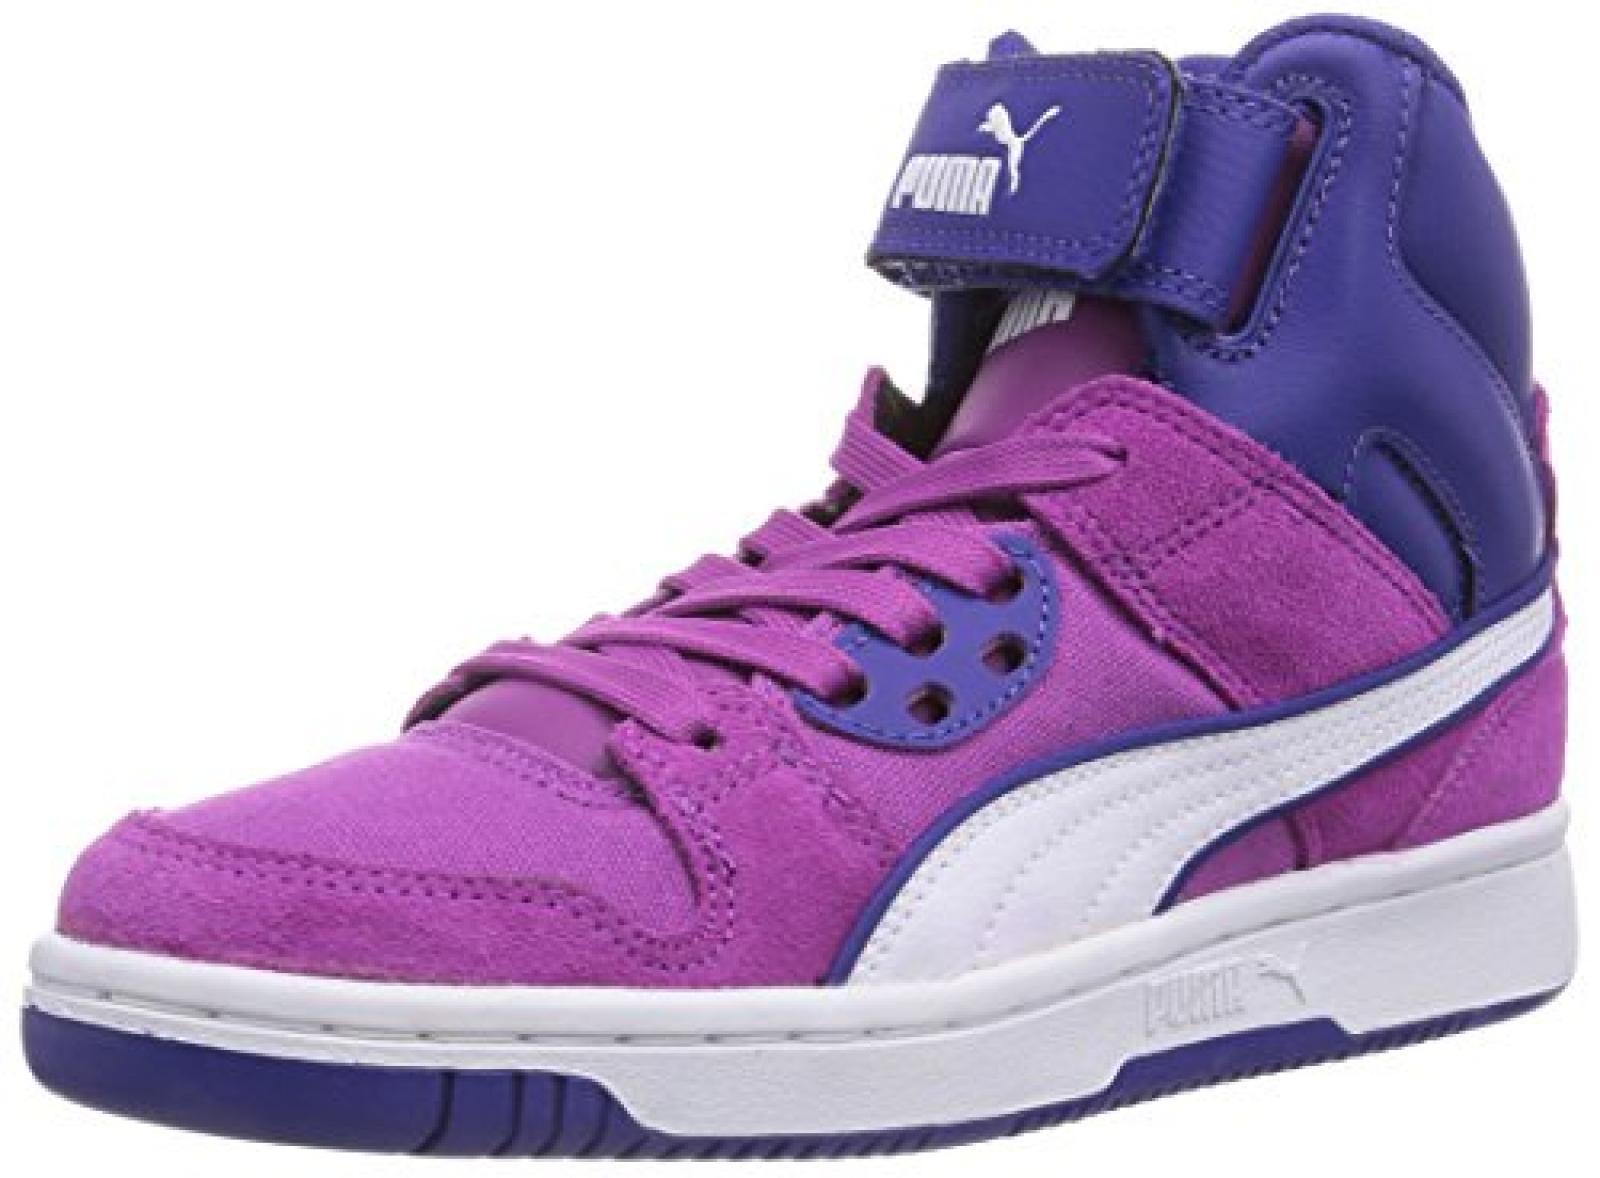 Puma Rebound Street CVS Unisex-Kinder Hohe Sneakers